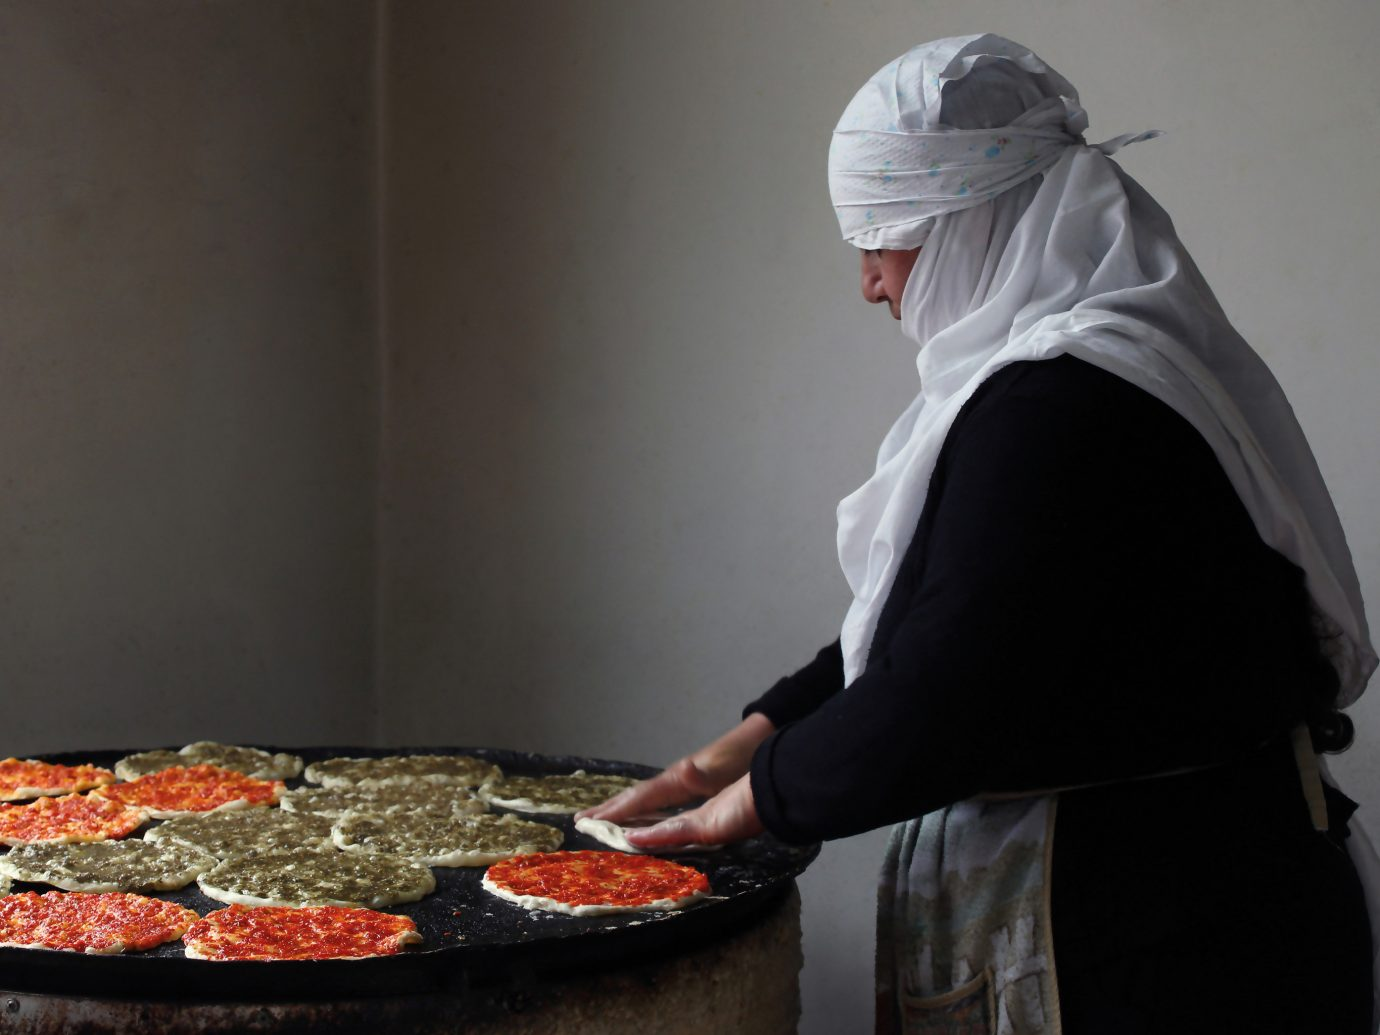 Food + Drink person wall indoor dish cuisine food sense cooking preparing